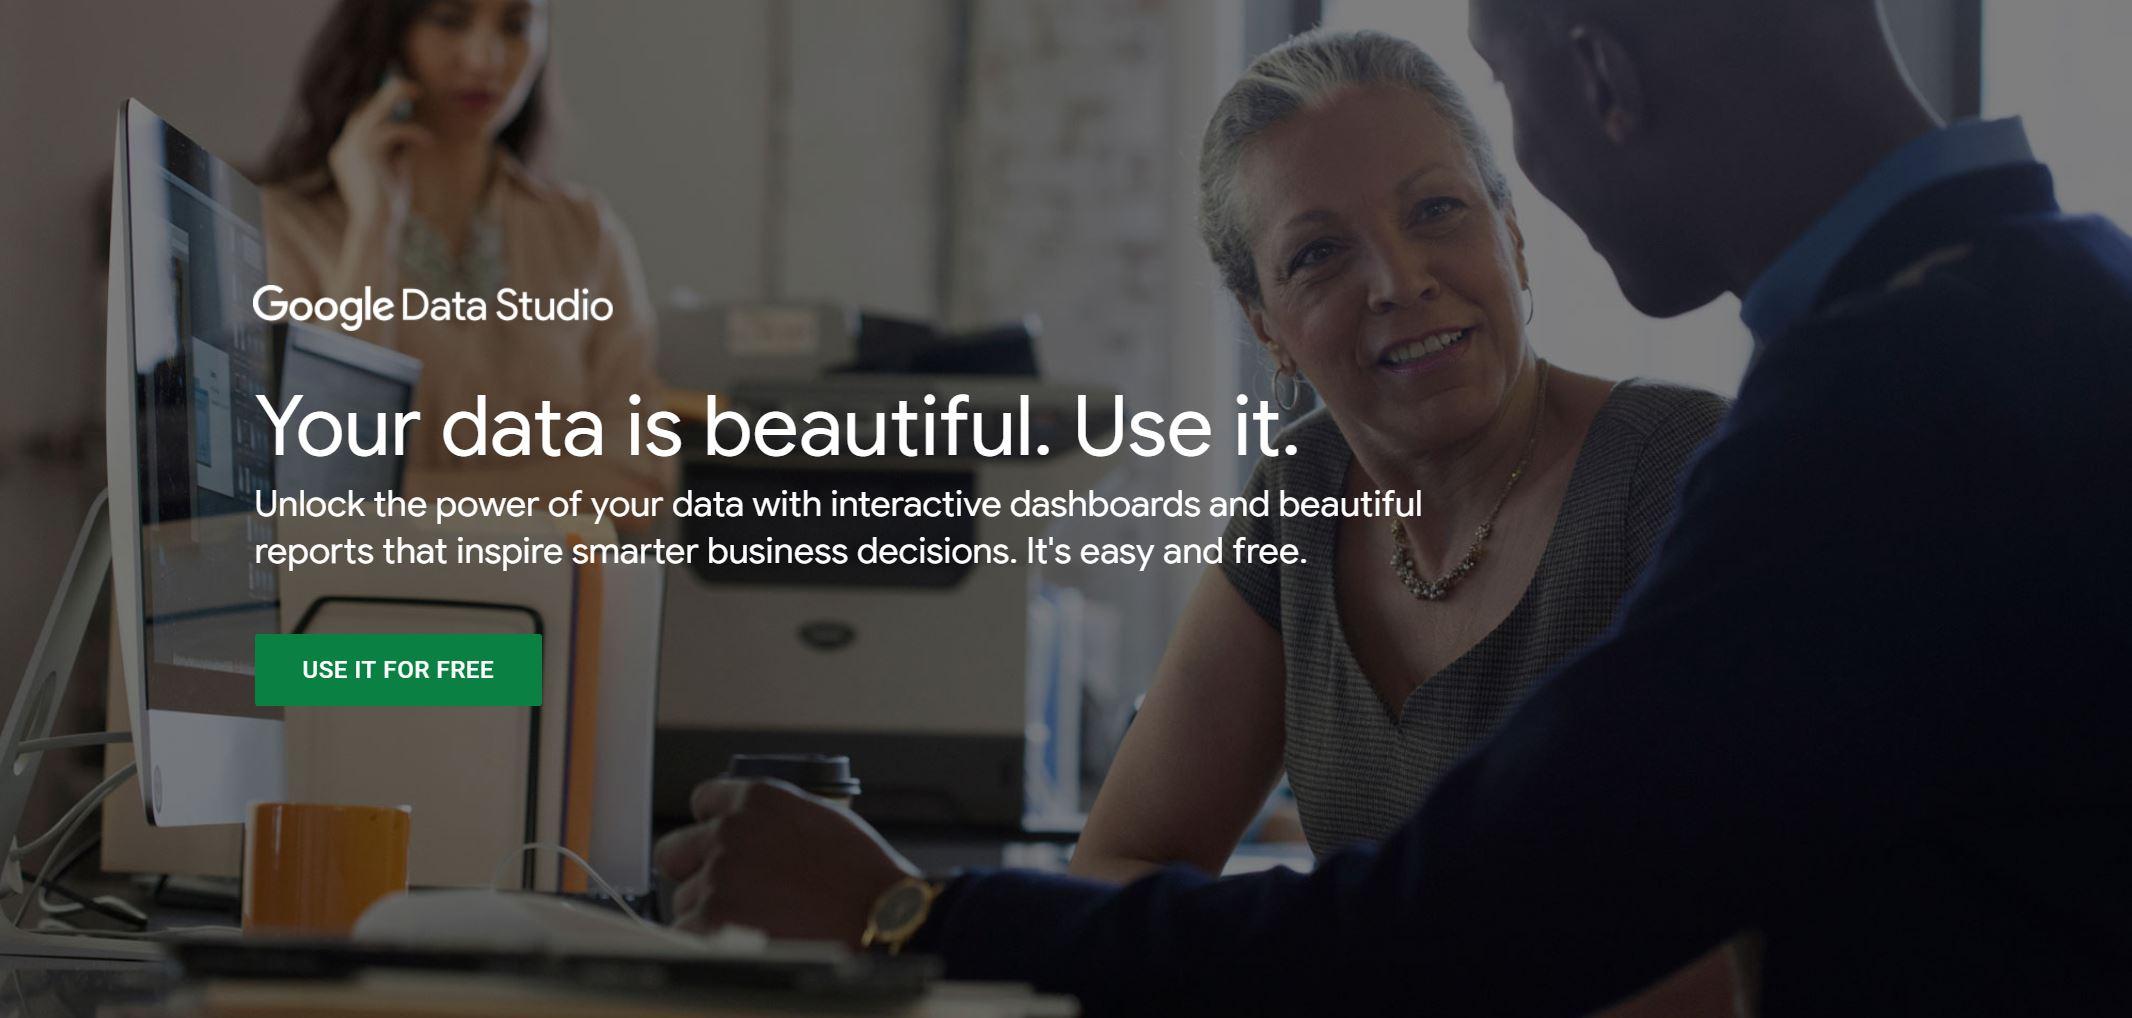 Google Data Studio Home